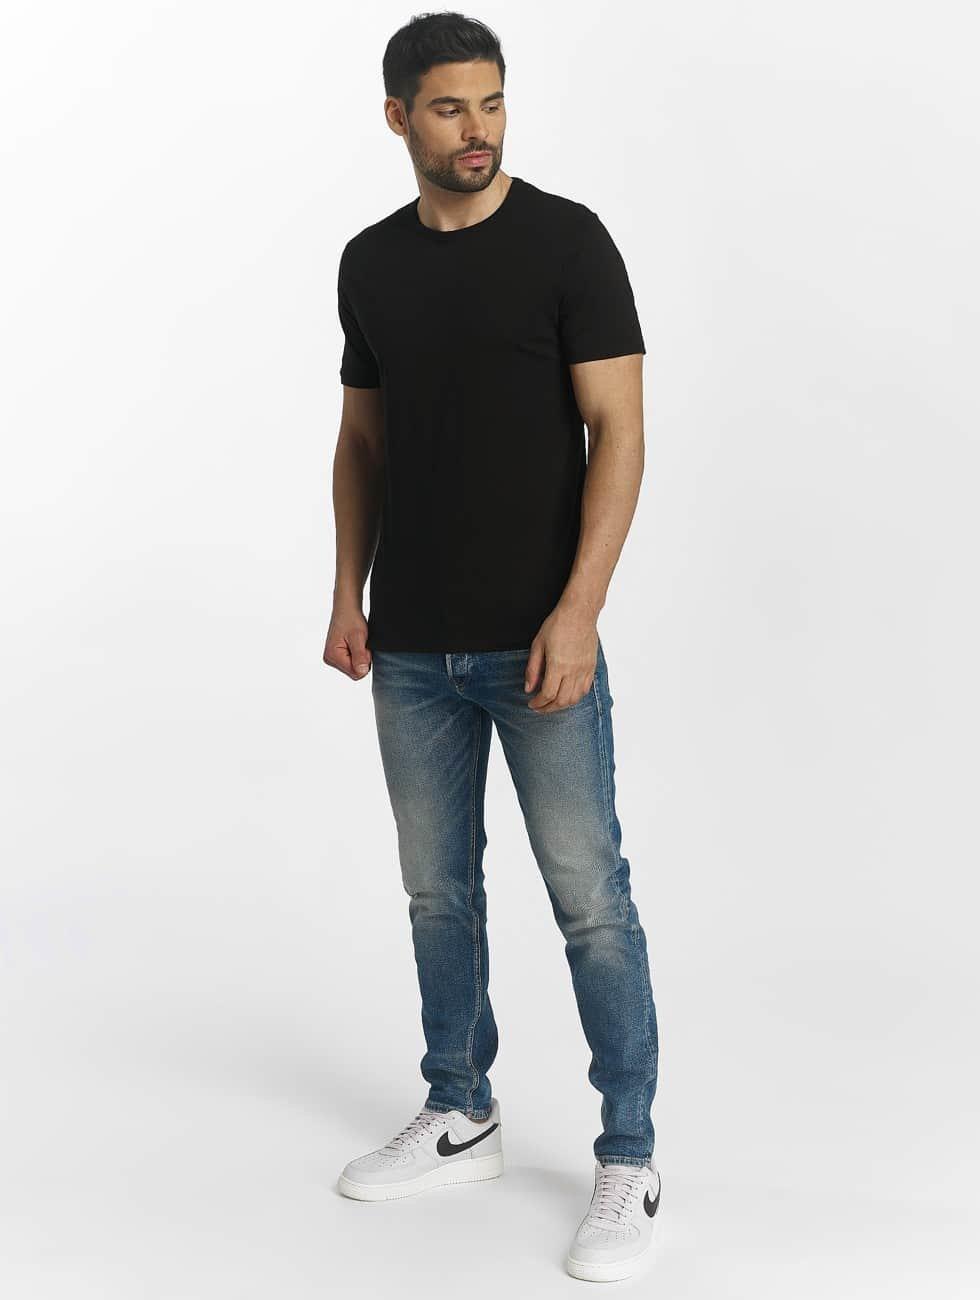 Jack & Jones t-shirt jacBasic zwart